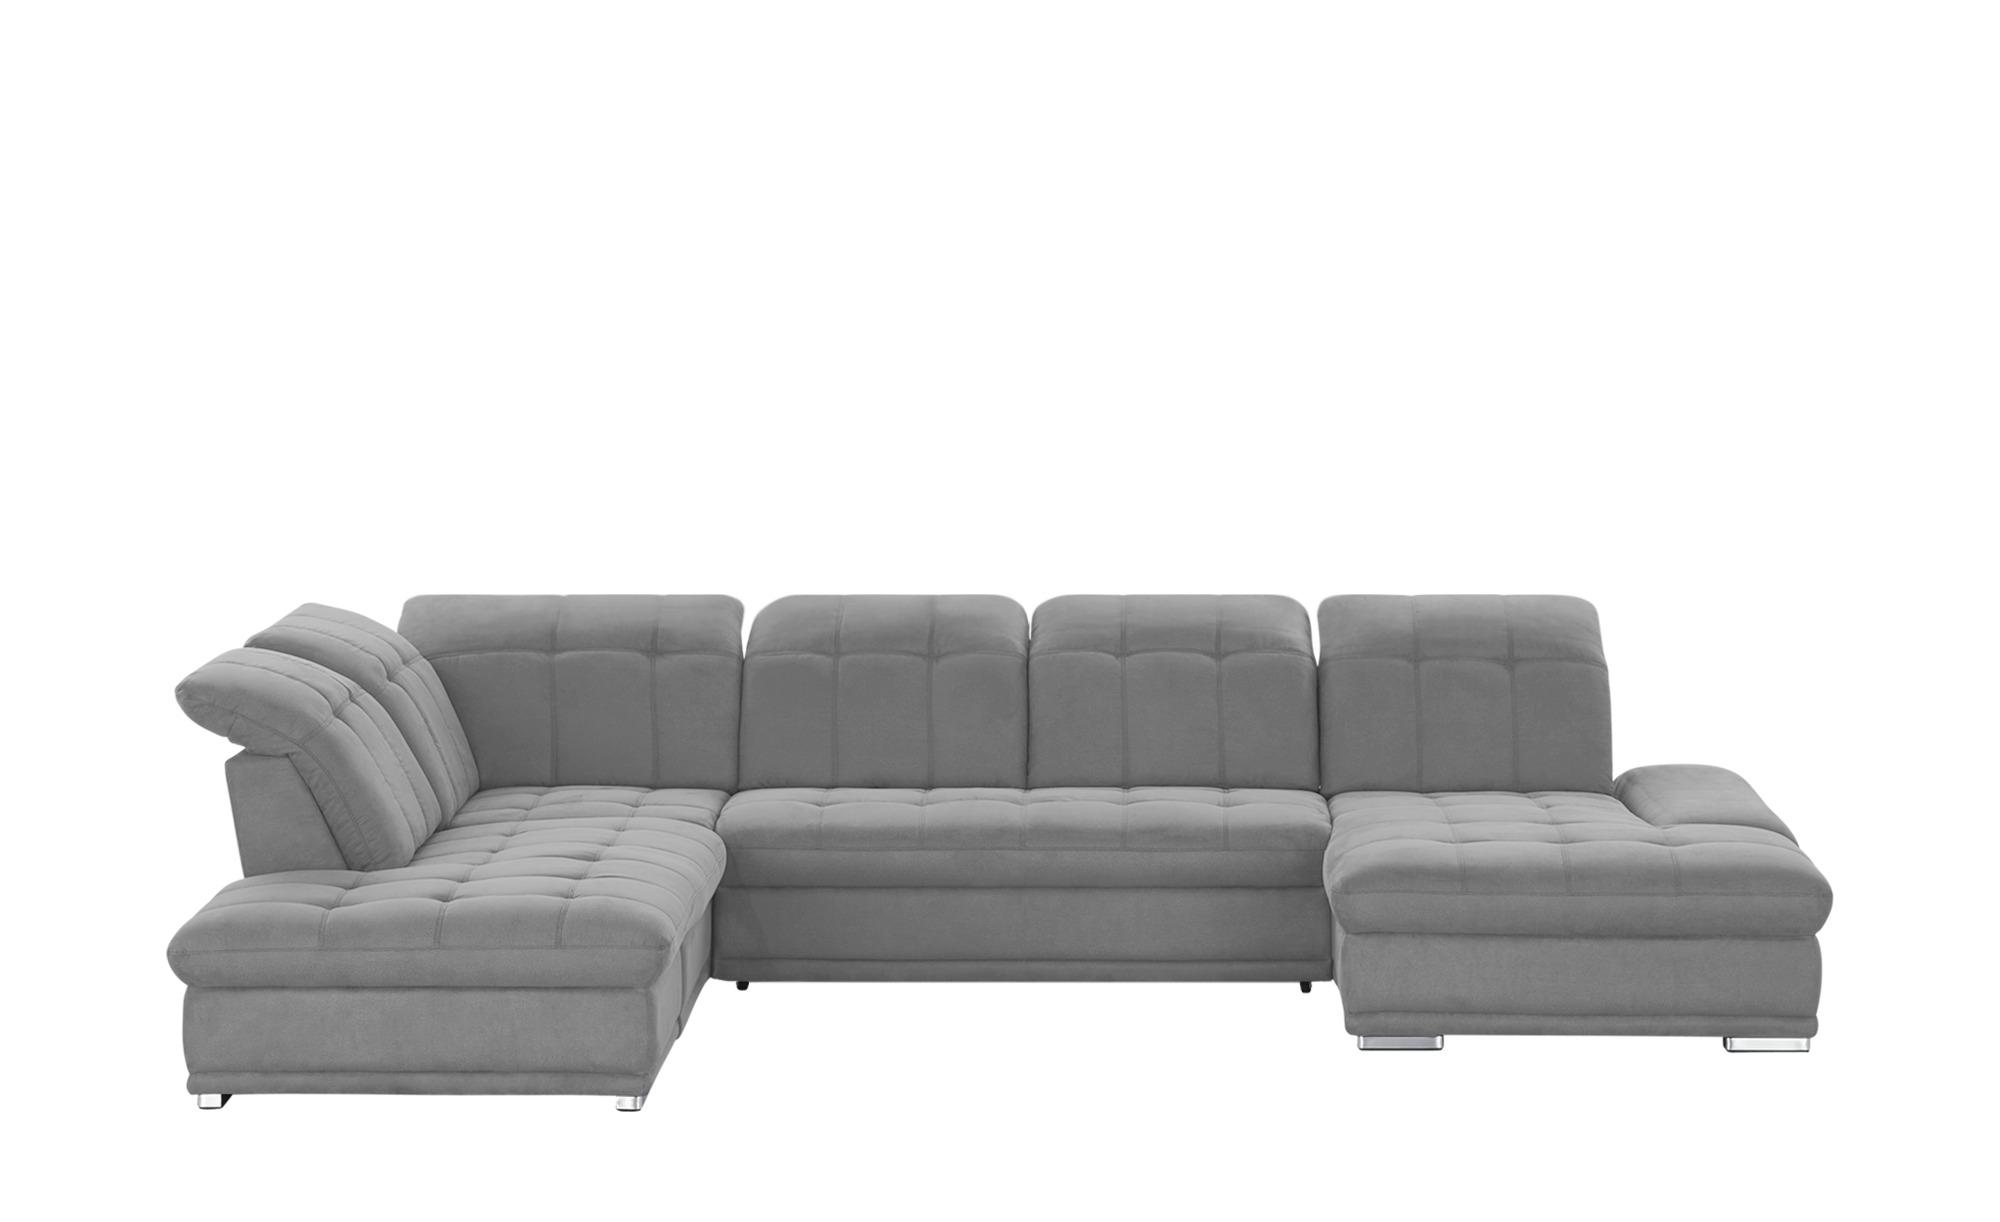 wohnlandschaft holiday breite h he 86 cm grau online. Black Bedroom Furniture Sets. Home Design Ideas